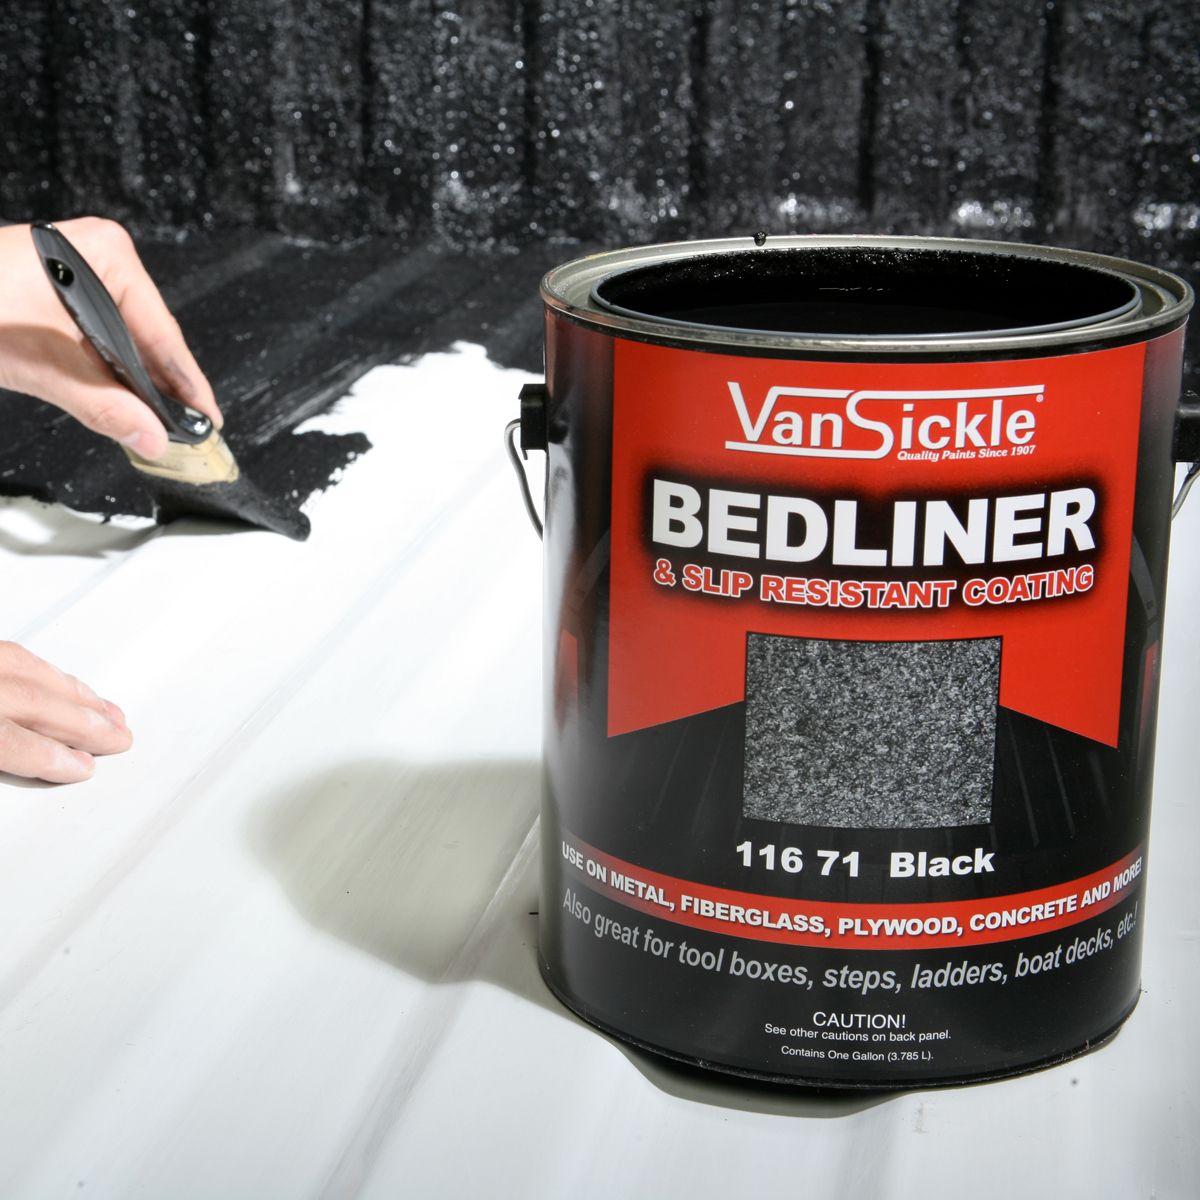 Van Sickle Bedliner & Slip Resistant Coating in 2020